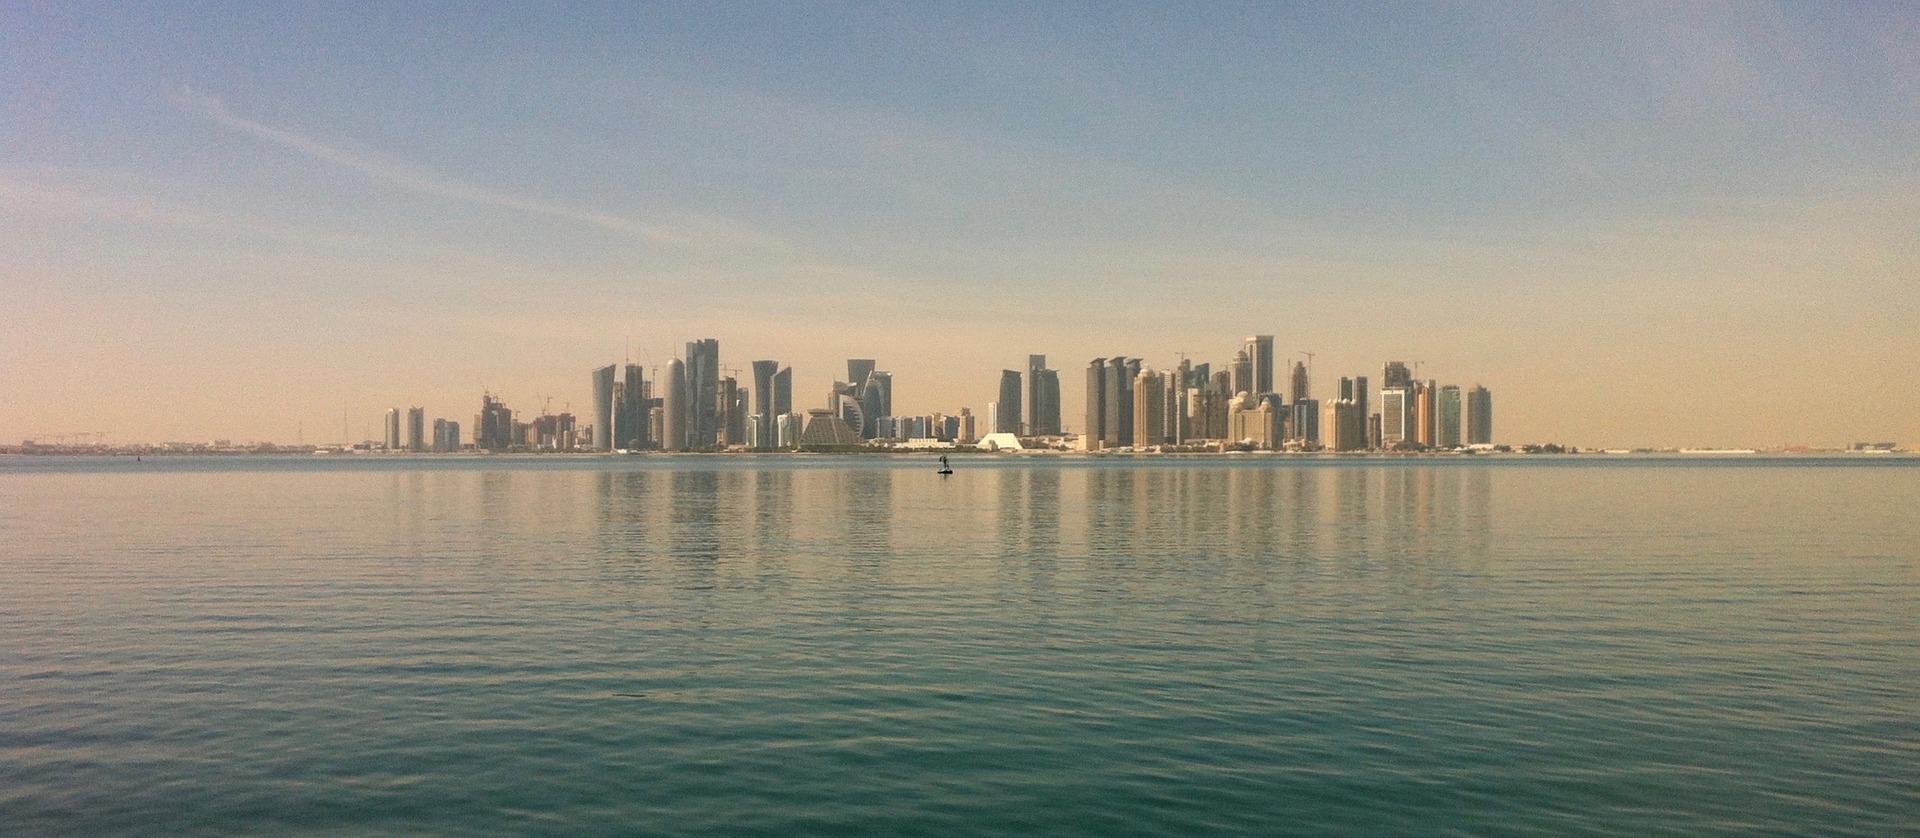 Katar 2022: Professor verteidigt Stadionkühlmethode